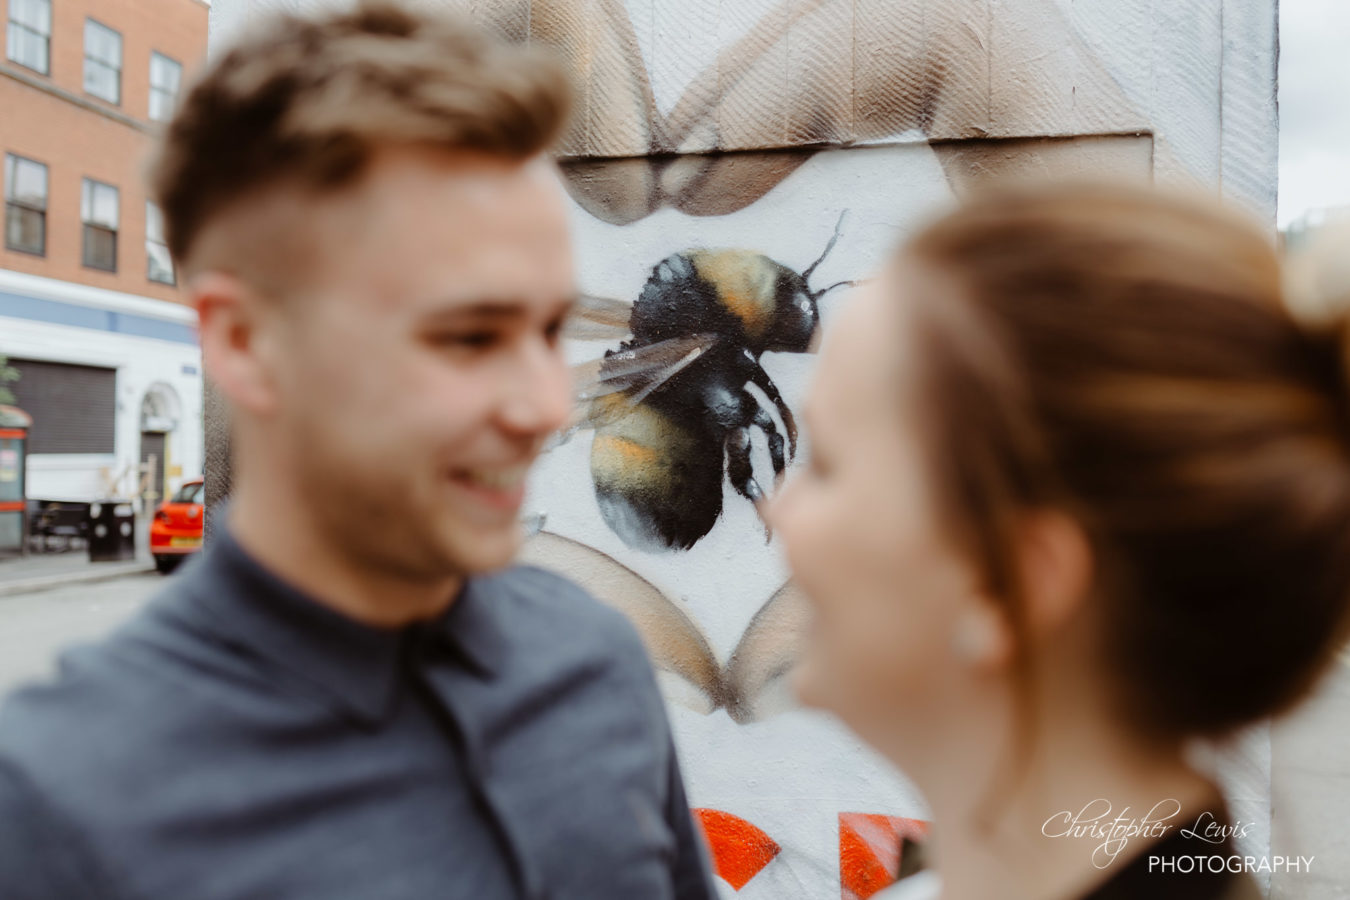 Northern-Quarter-Manchester-Pre-Wedding-Photoshoot-13